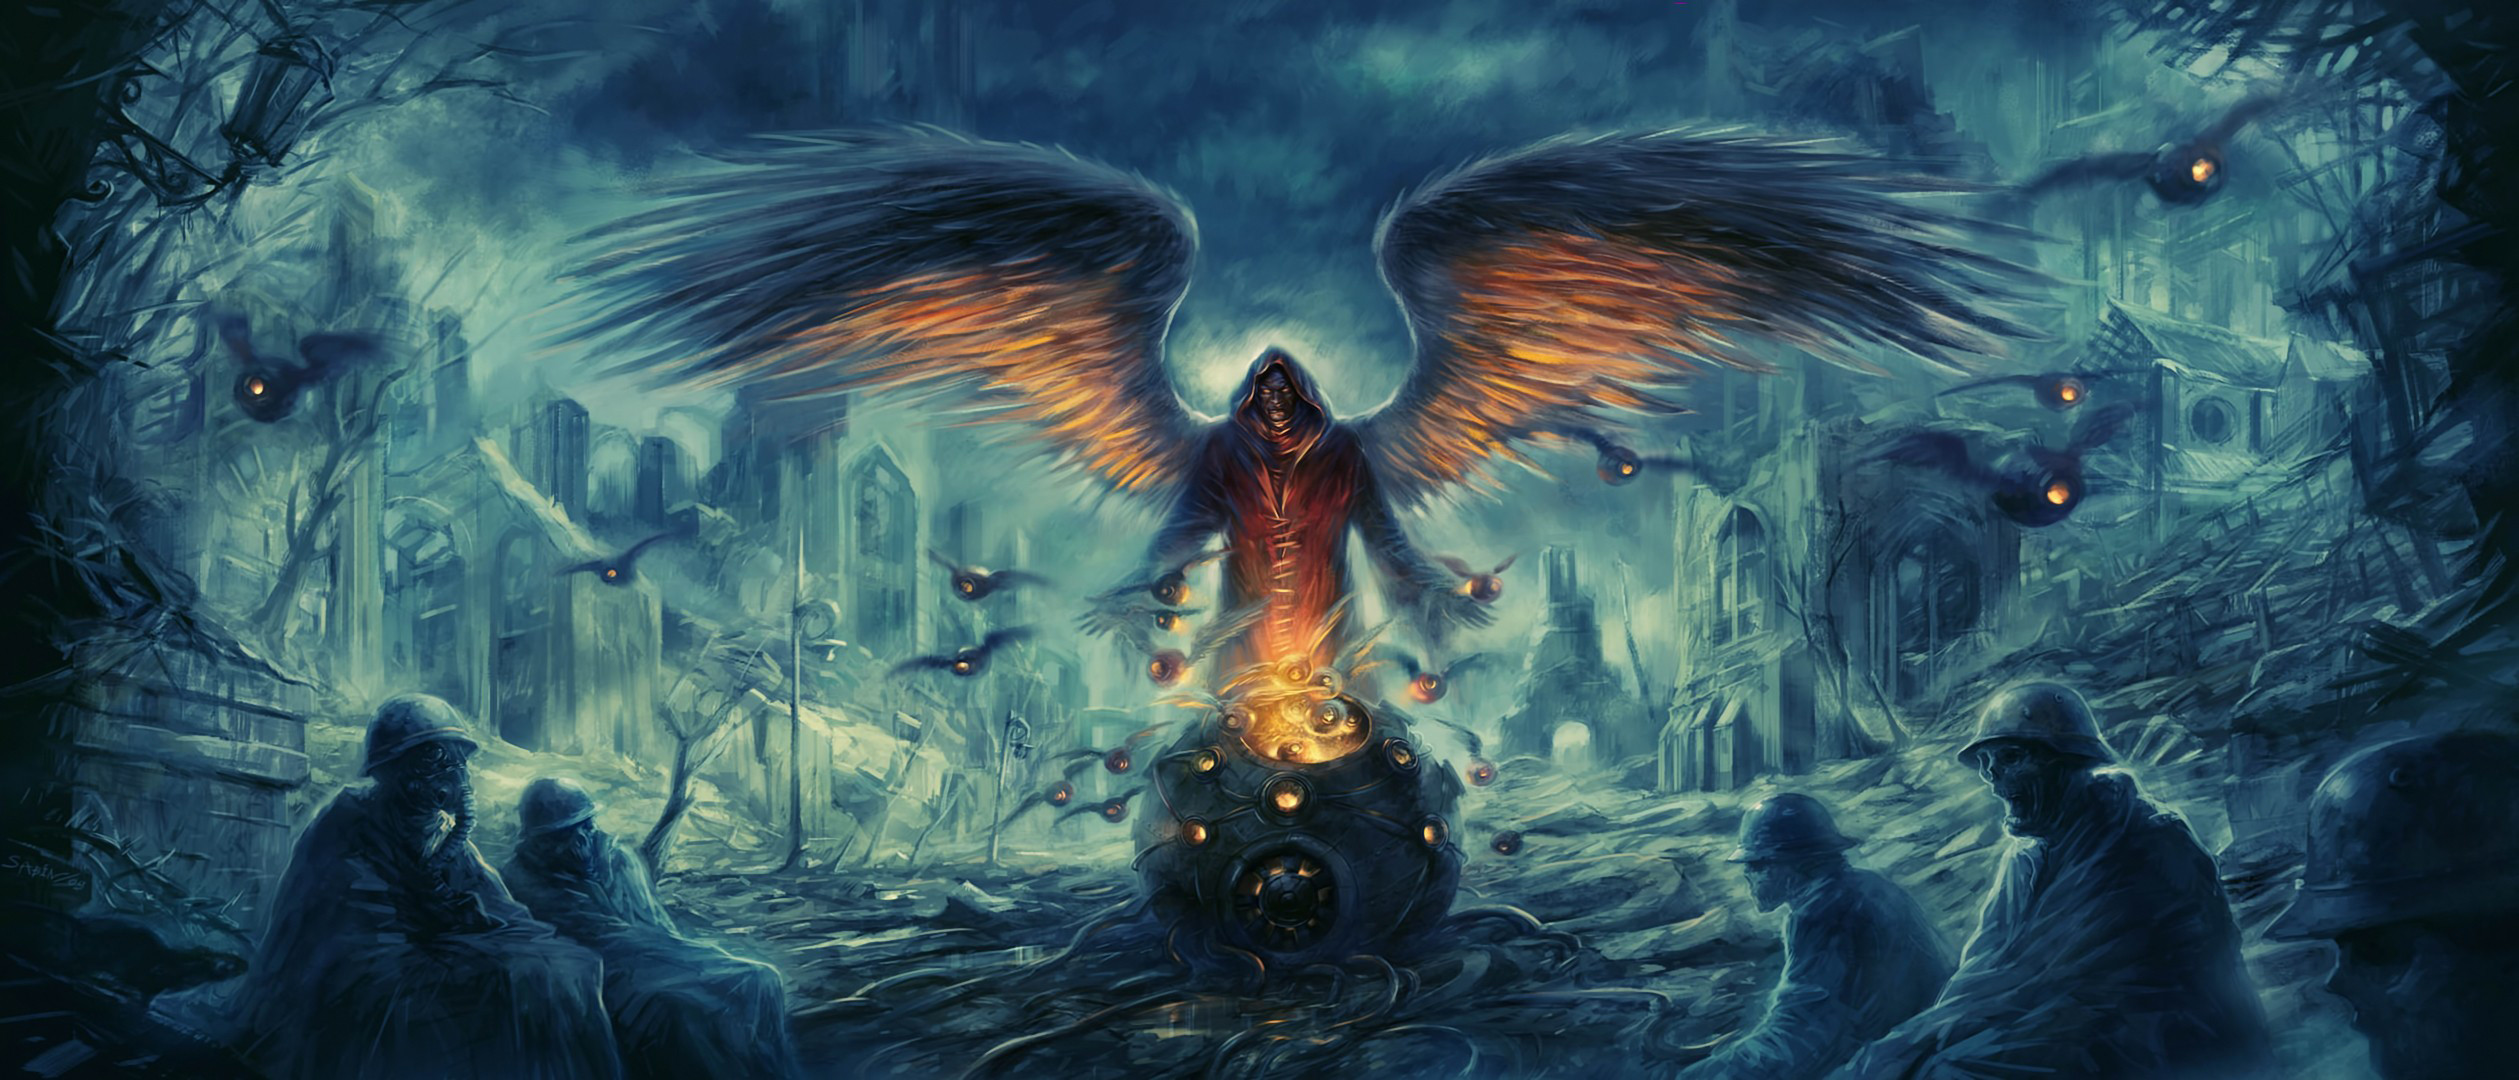 Dark Angel Wallpaper Android Apps on Google Play 1440×769 Dark Angel  Wallpaper (40